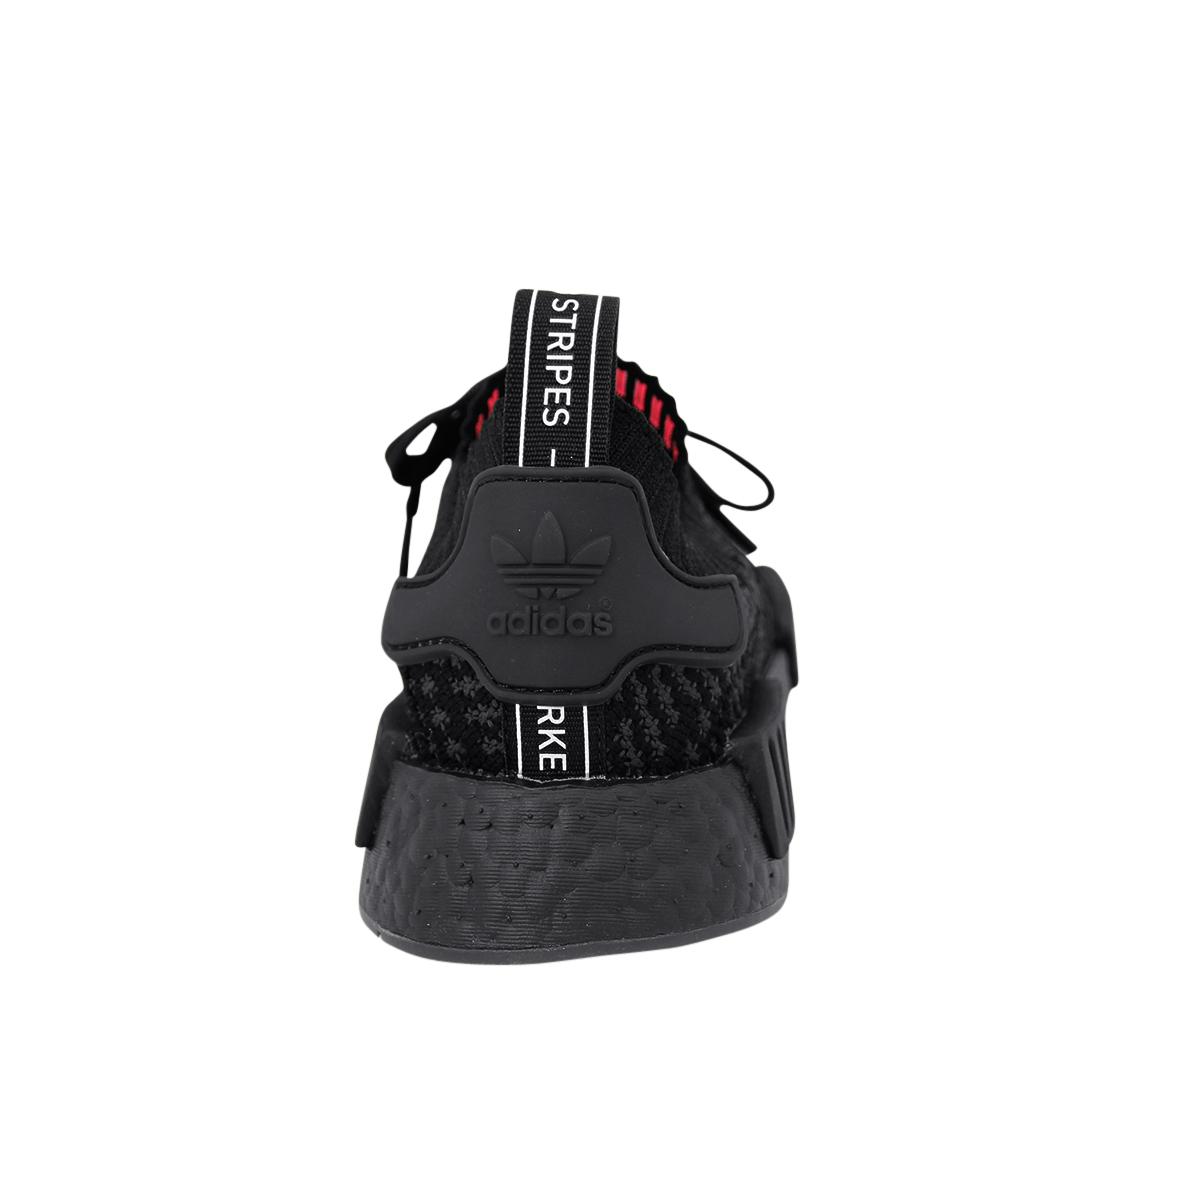 Adidas NMD R1 STLT Primeknit Mens Sneakers Shoes New   eBay